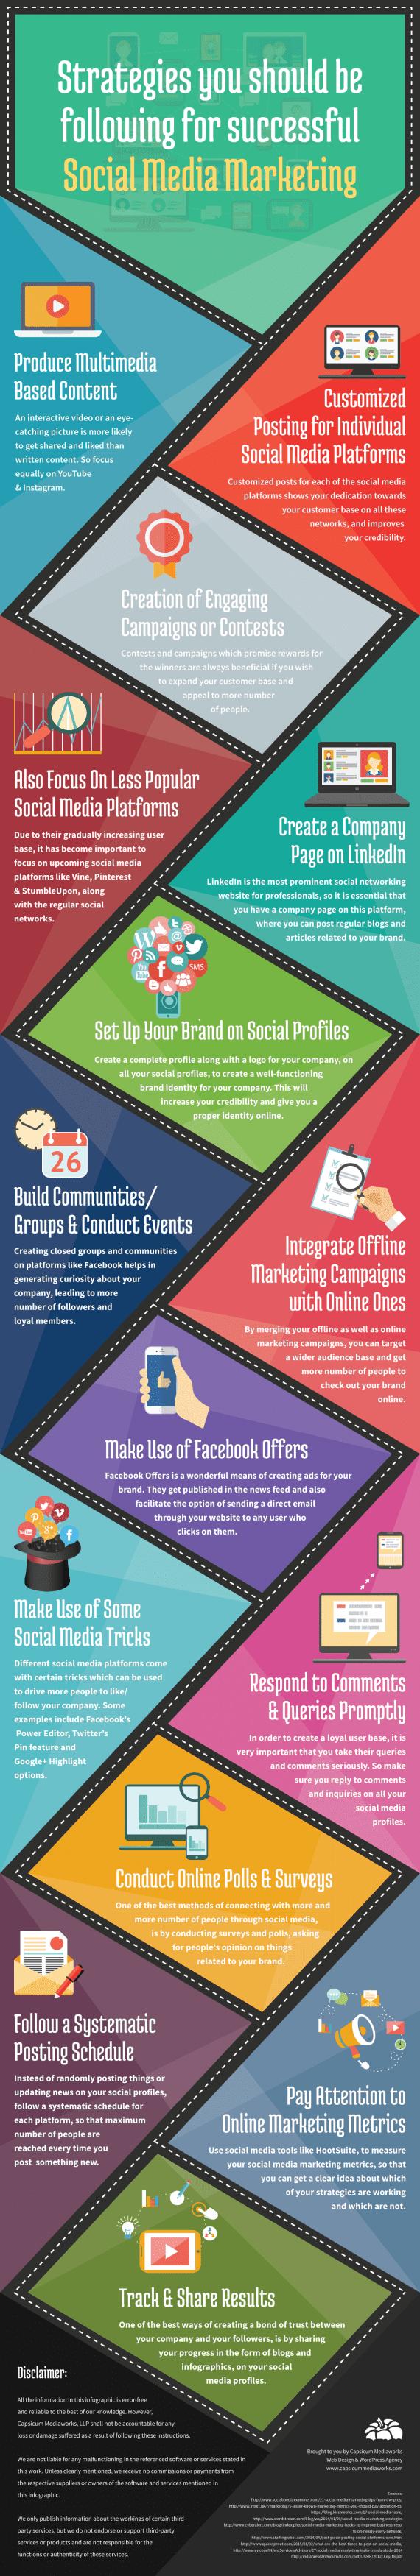 The-Ultimate-Guide-Social-Media-Marketing